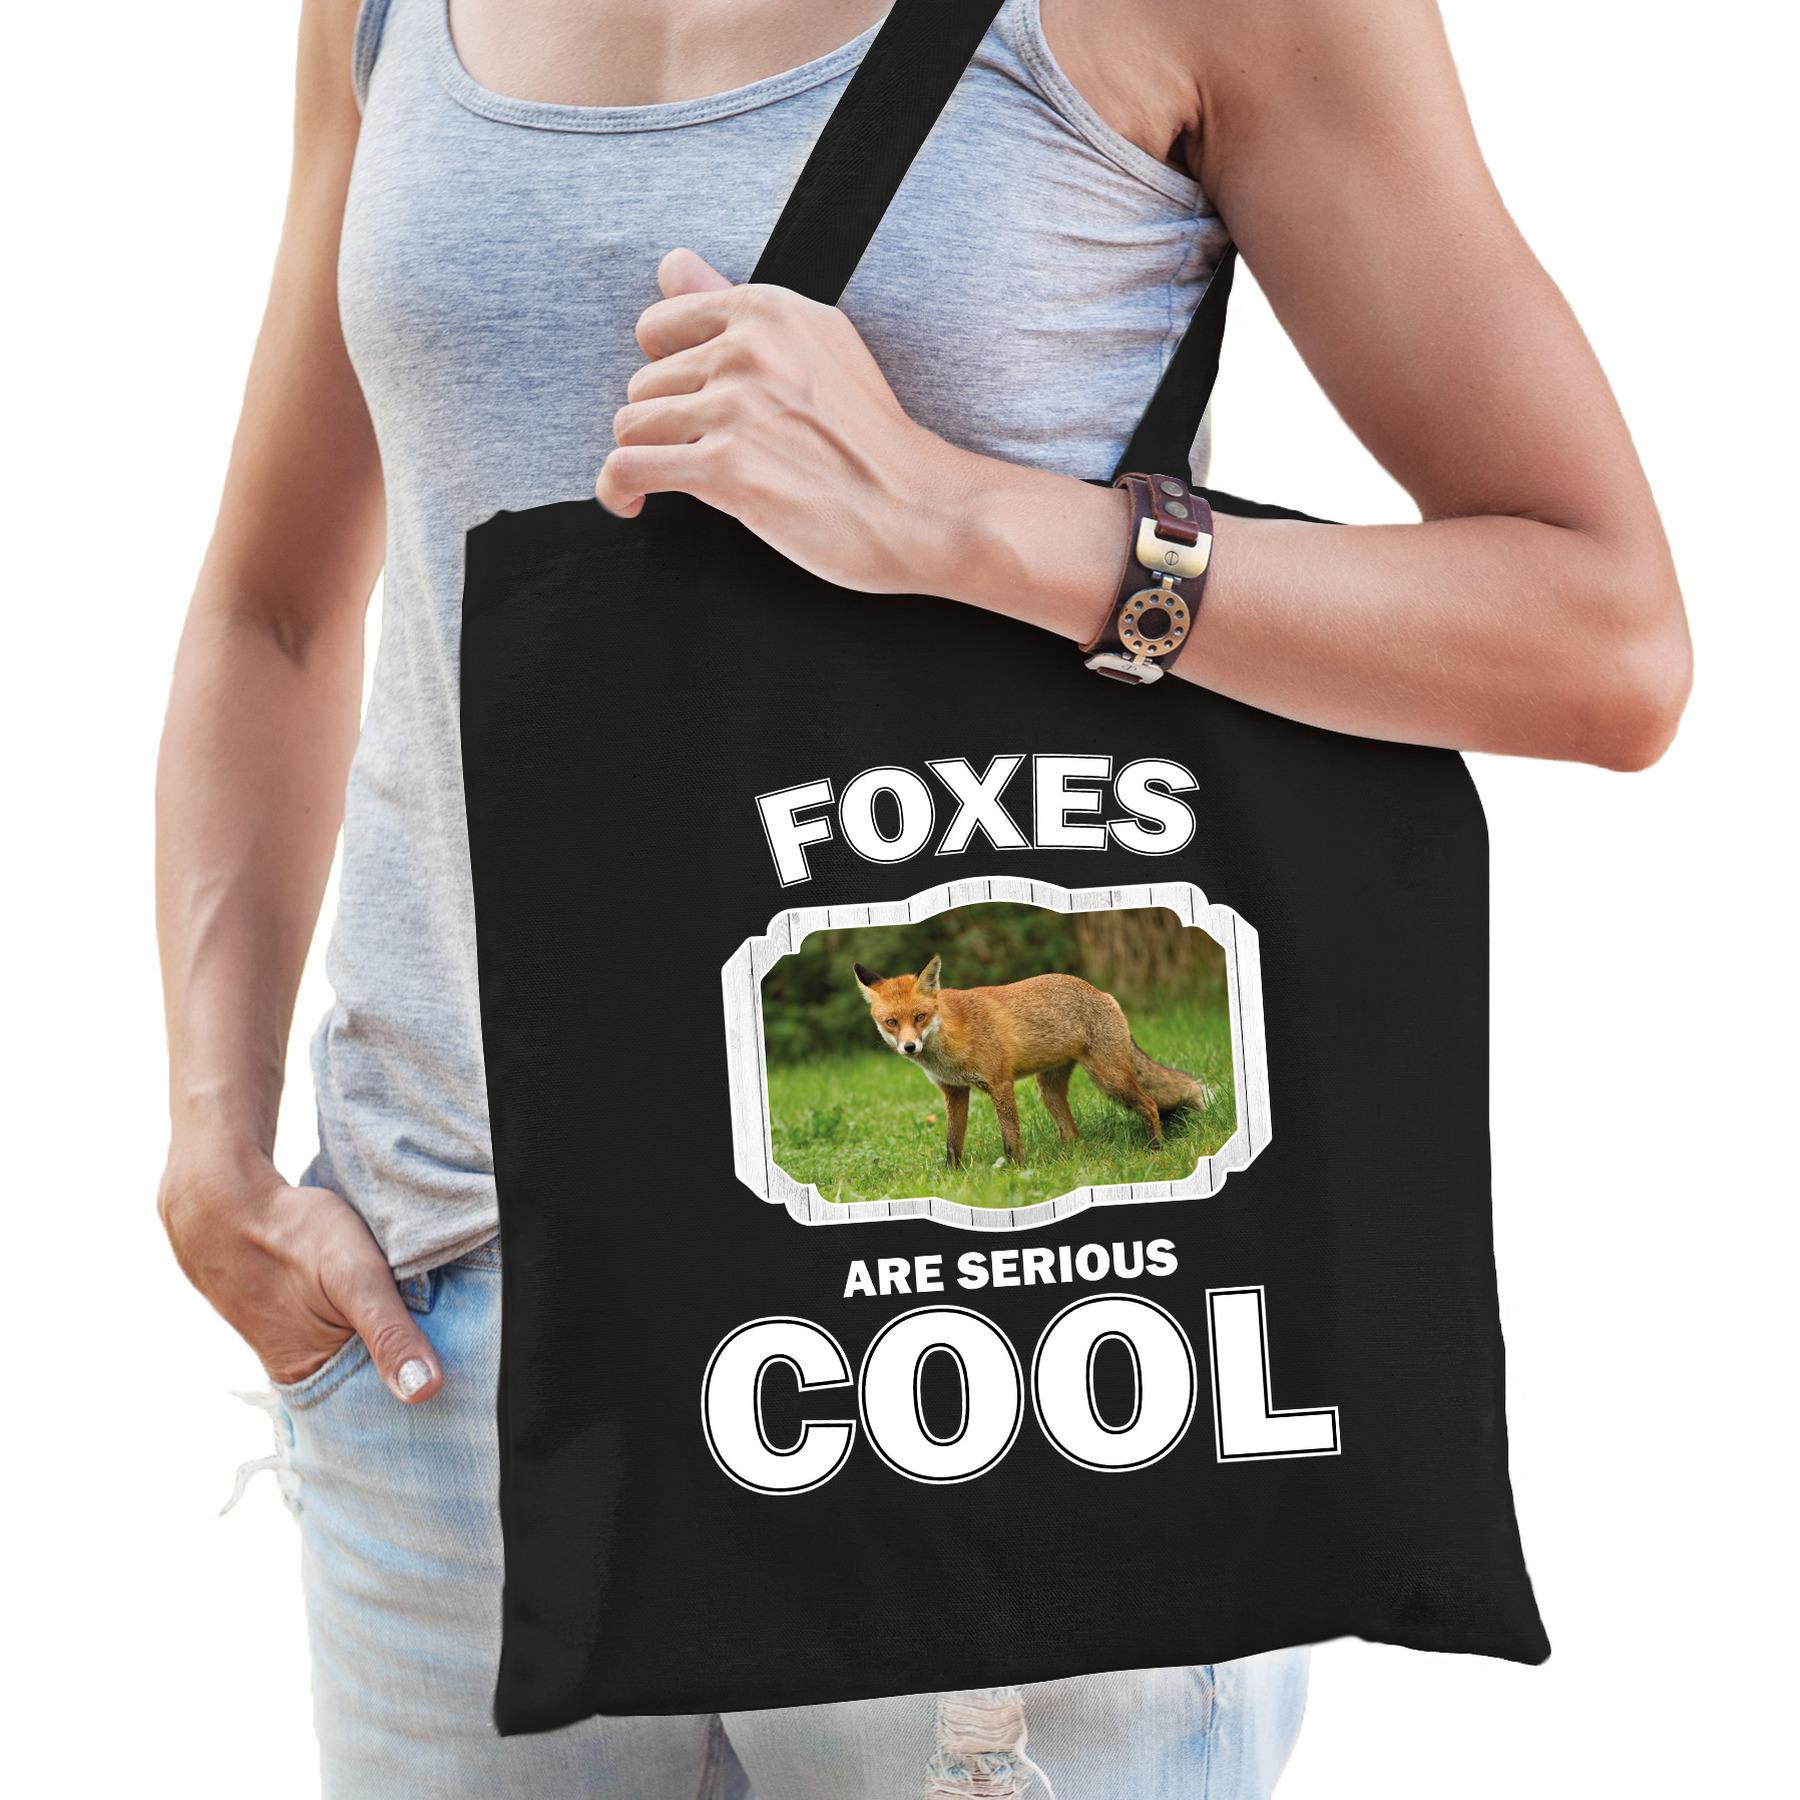 Katoenen tasje foxes are serious cool zwart - vossen/ bruine vos cadeau tas